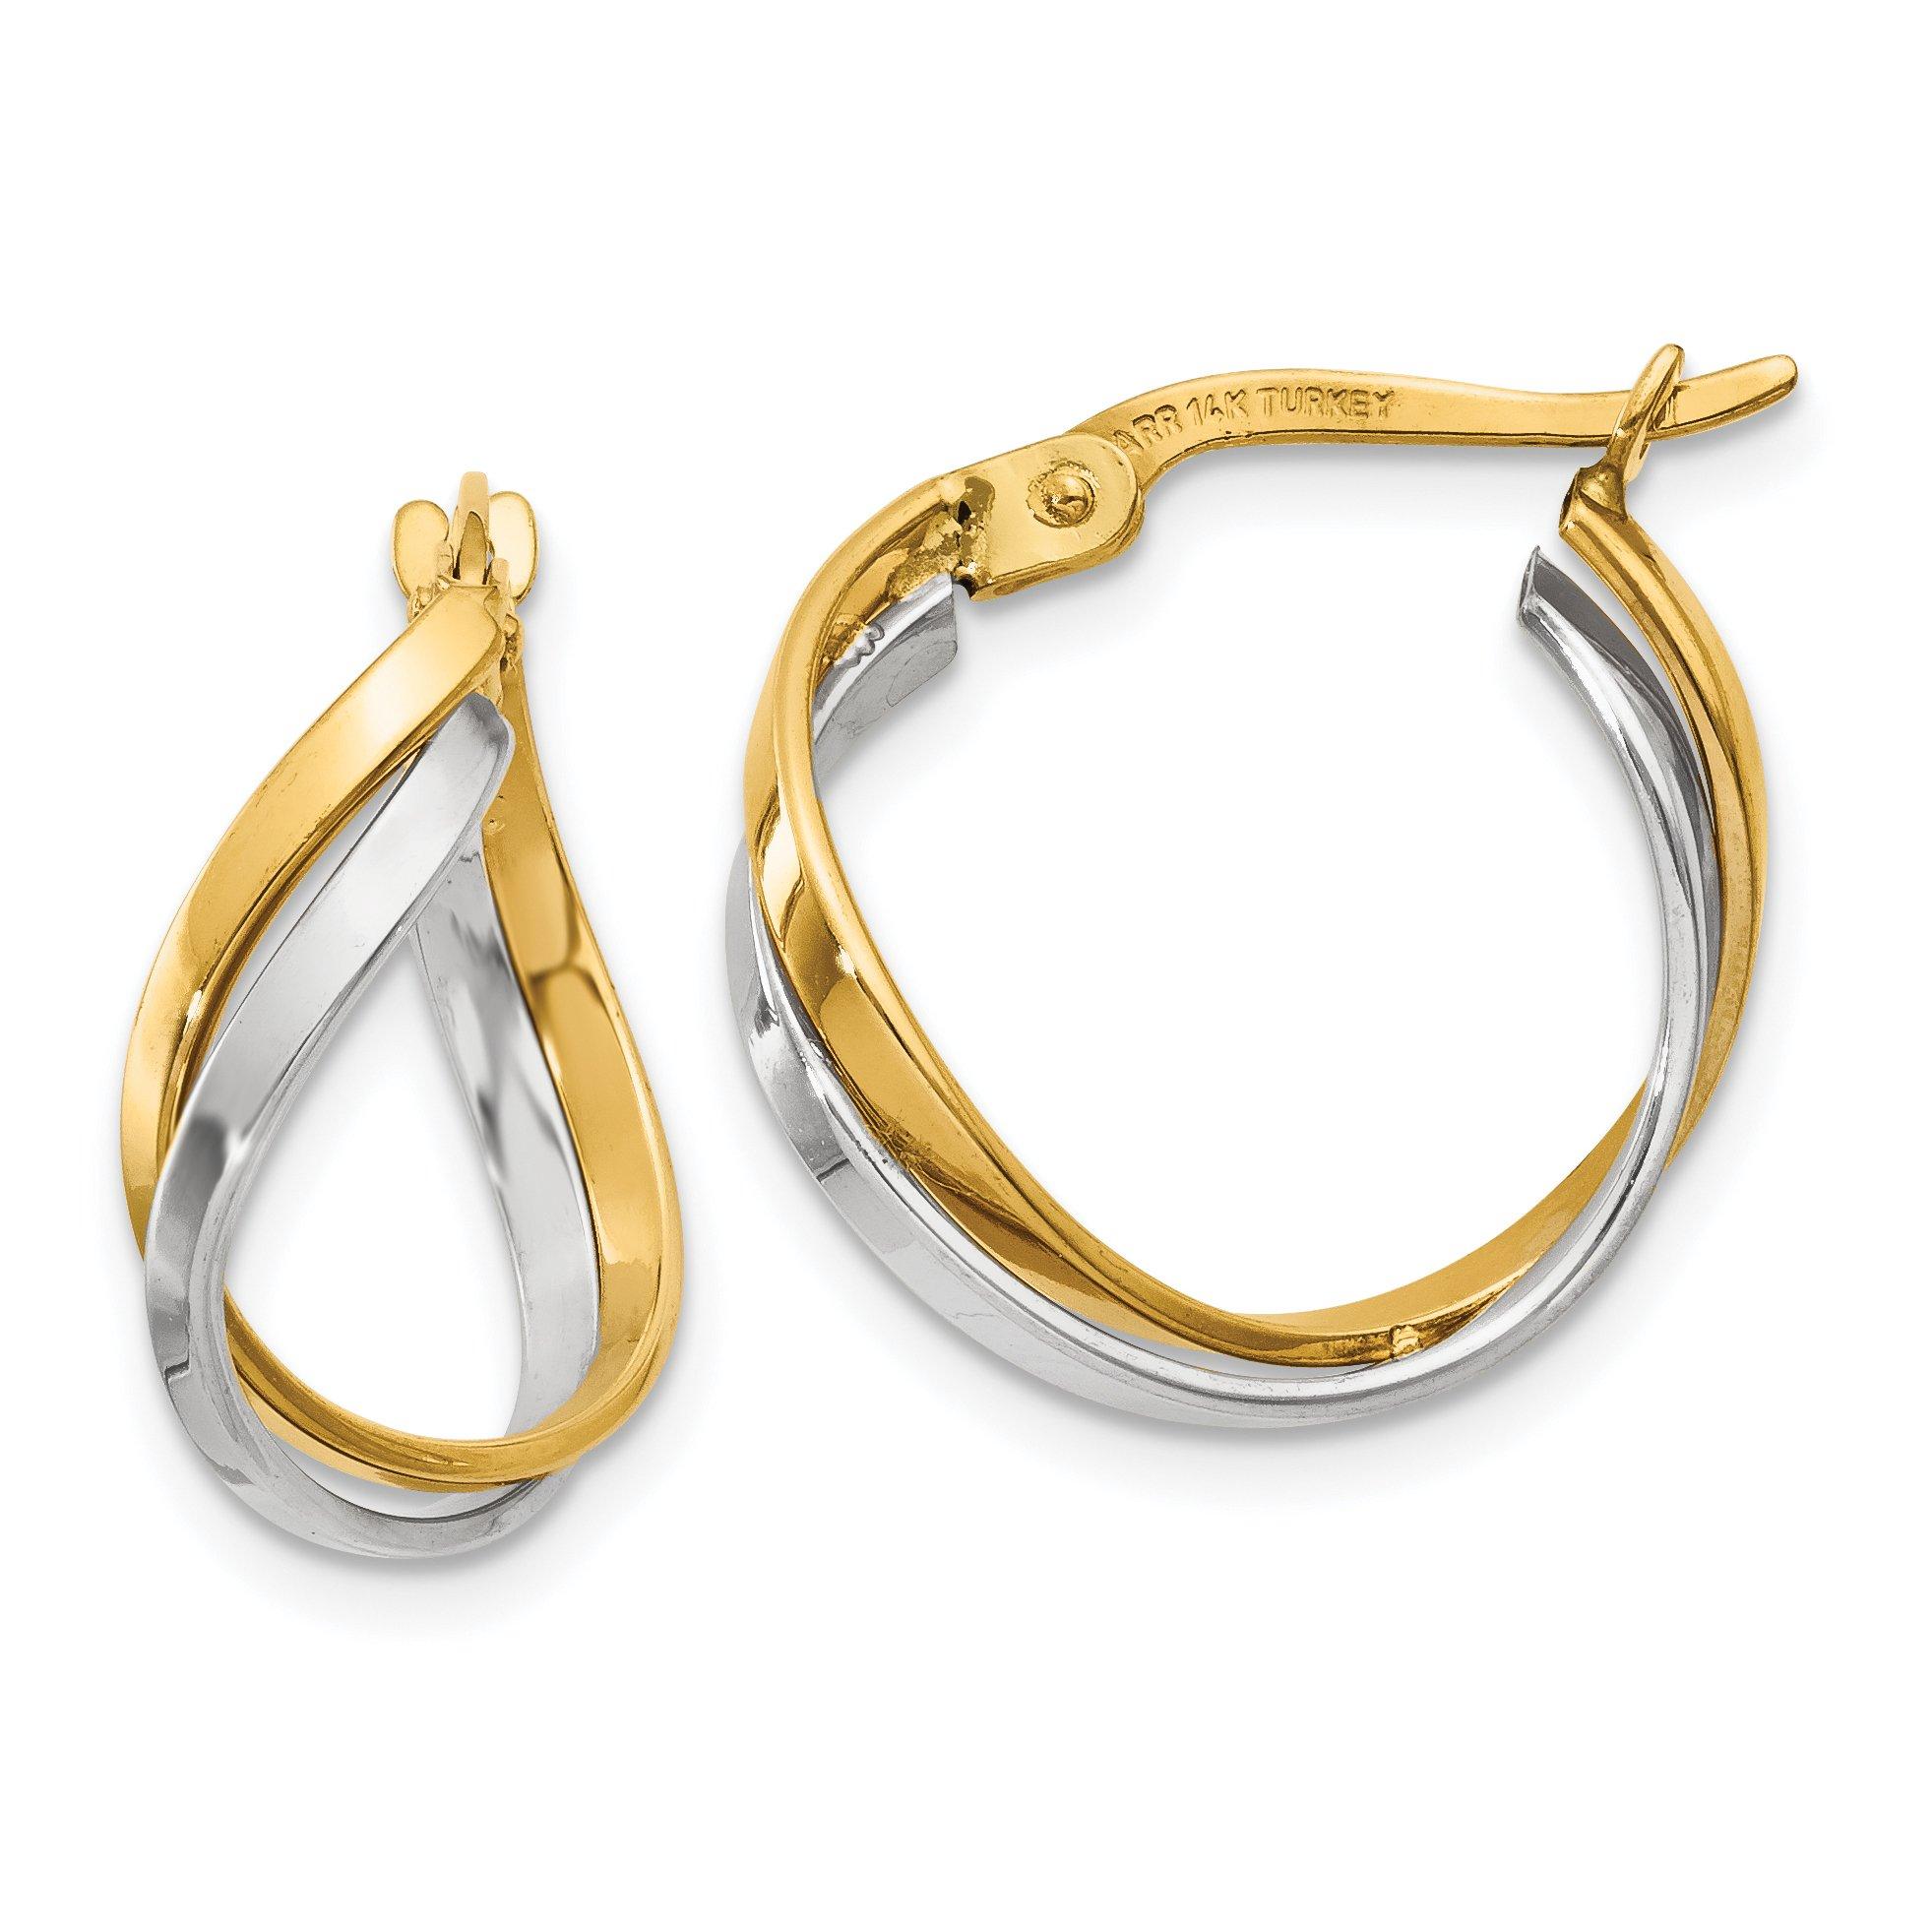 ICE CARATS 14k Two Tone Yellow Gold Twisted Hoop Earrings Ear Hoops Set Fine Jewelry Gift Set For Women Heart